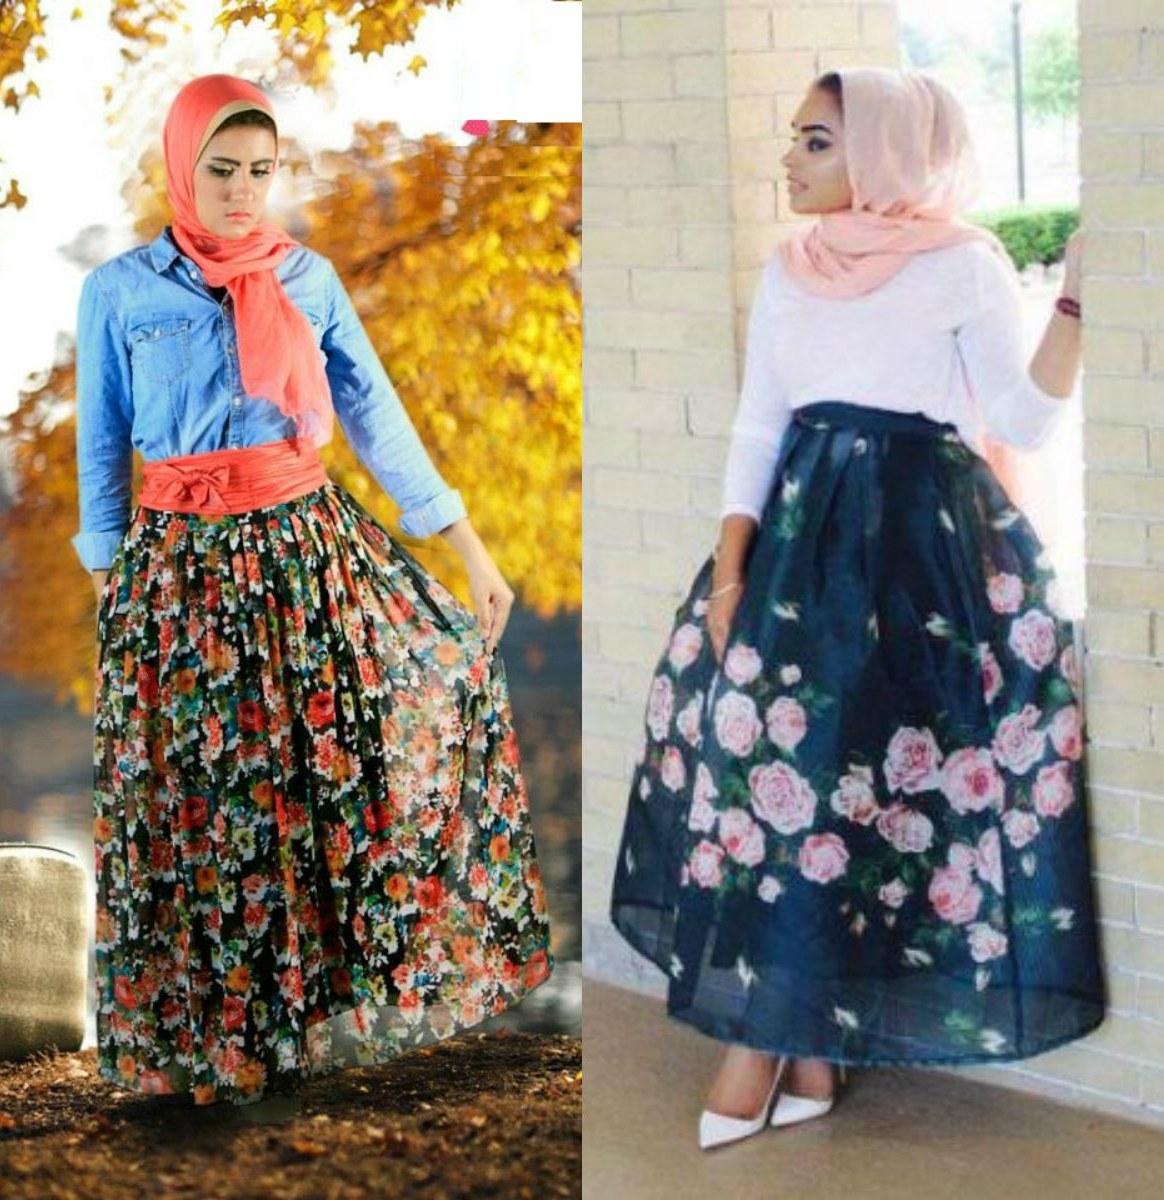 Bentuk Baju Lebaran Remaja Xtd6 Inspirasi Baju Lebaran Untuk Remaja Putri